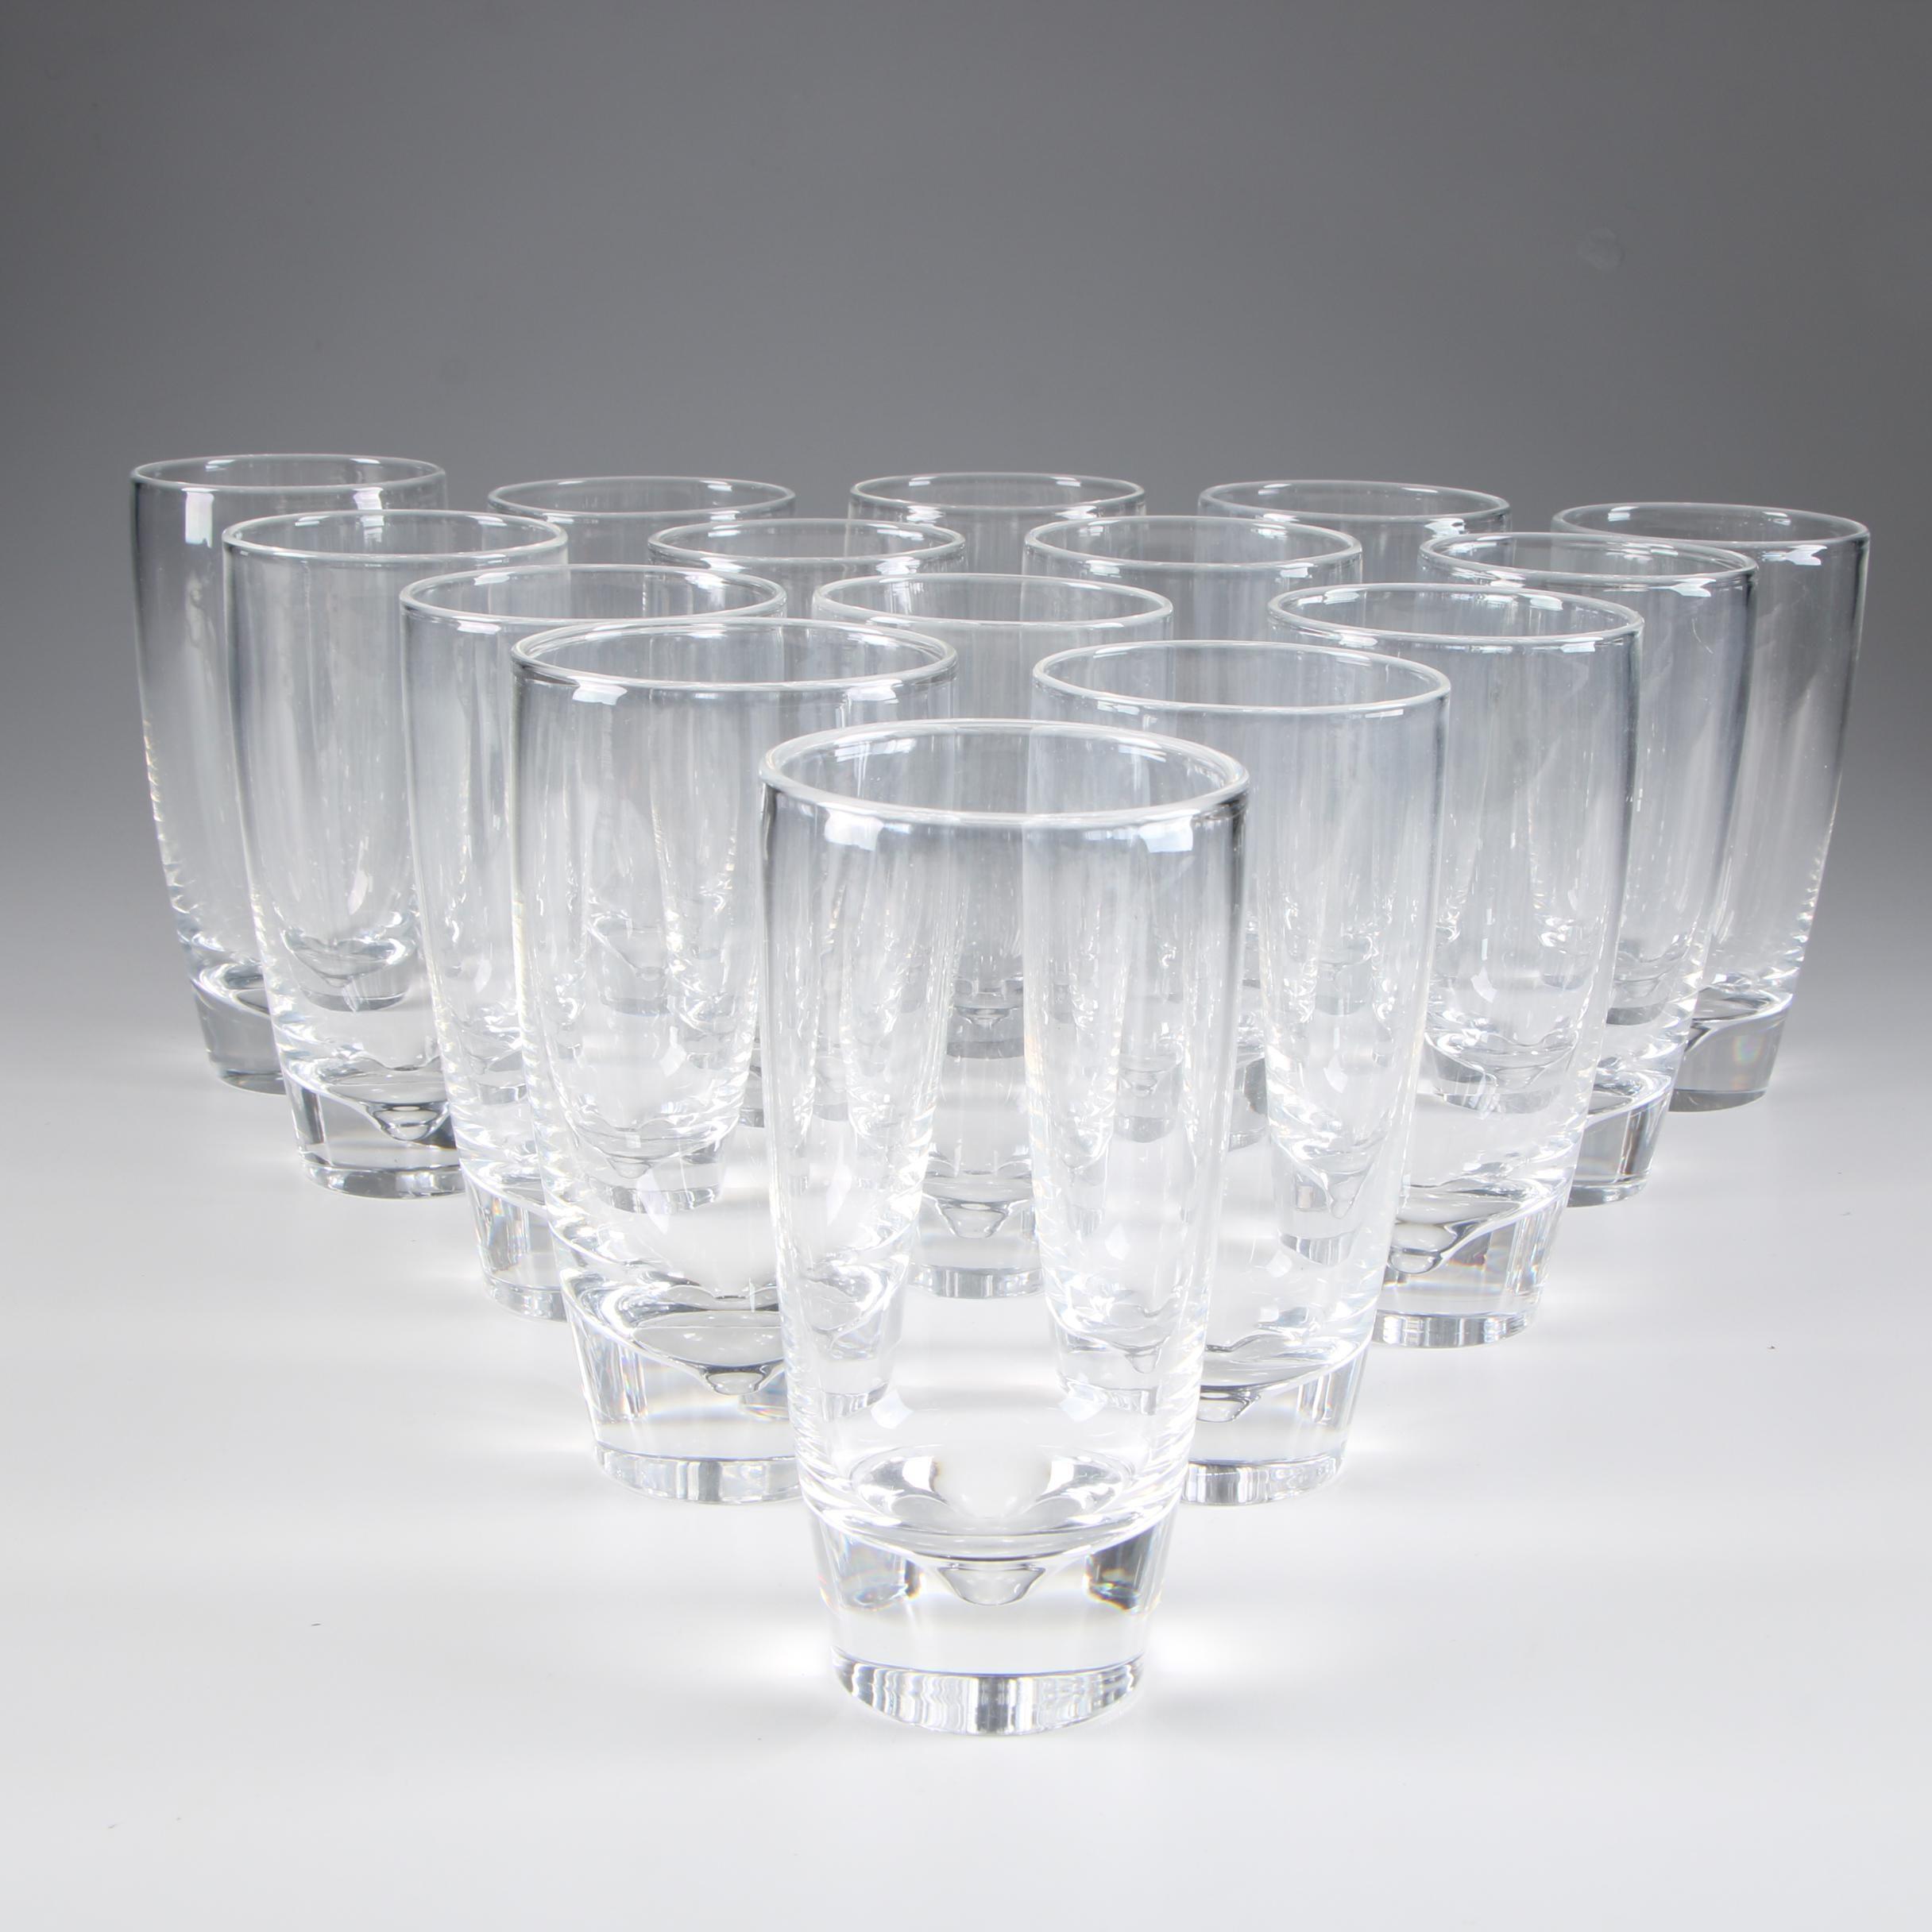 Steuben Art Glass Flat Tumblers, Mid-Century